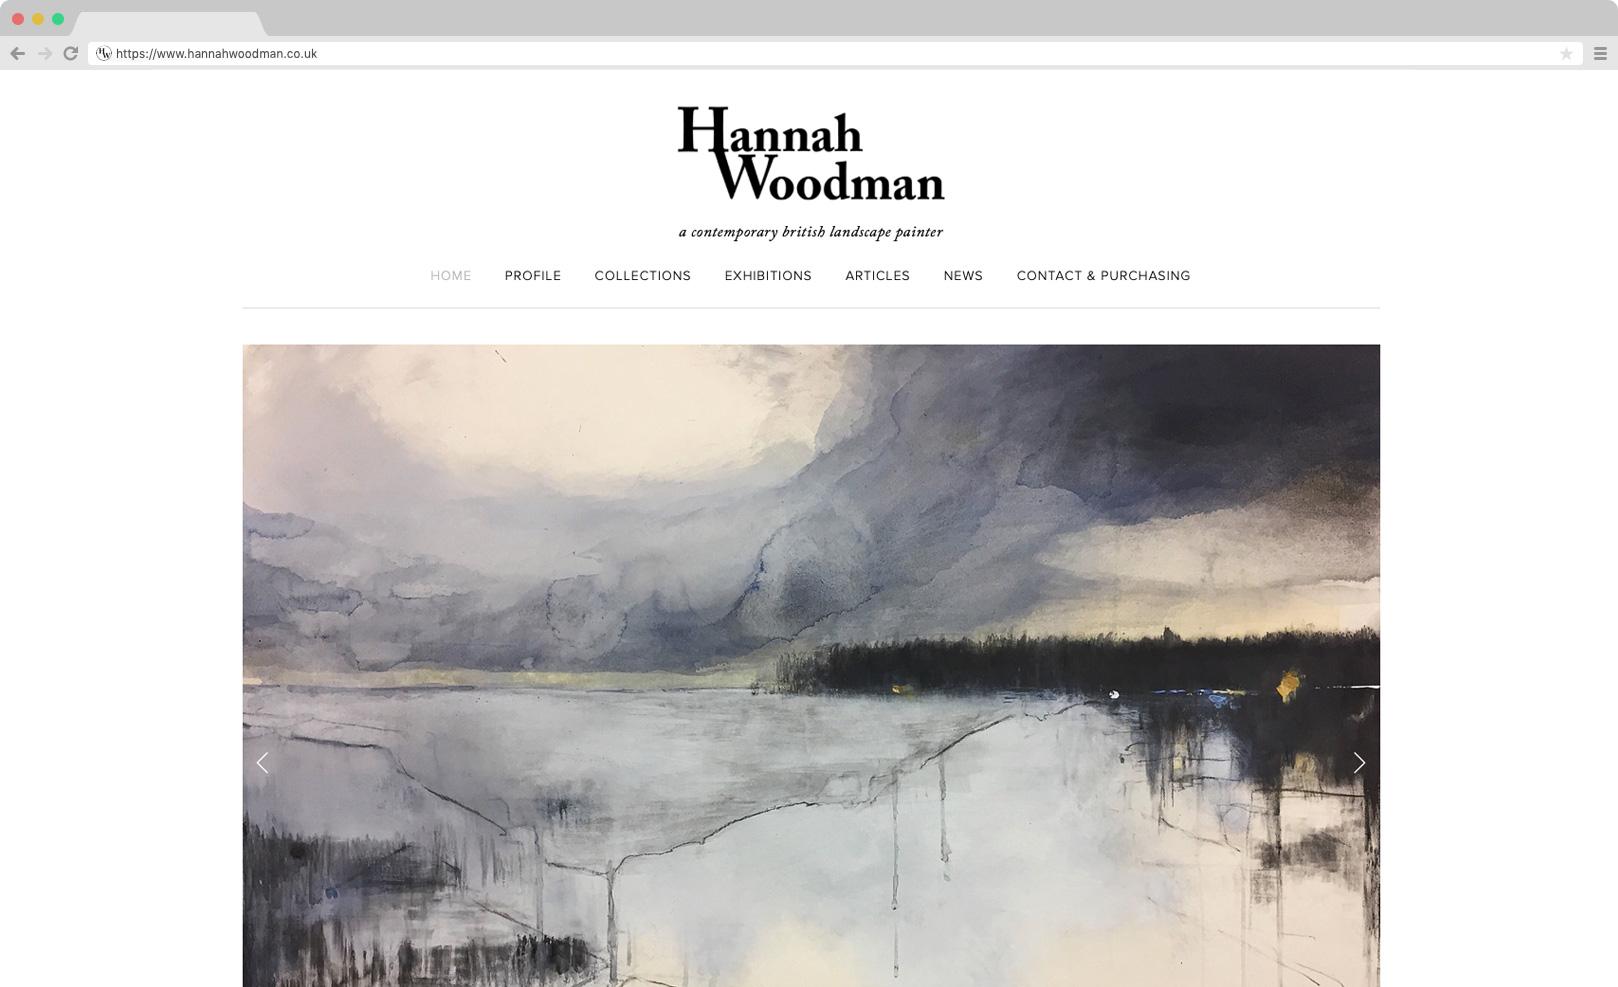 Hannah Woodman